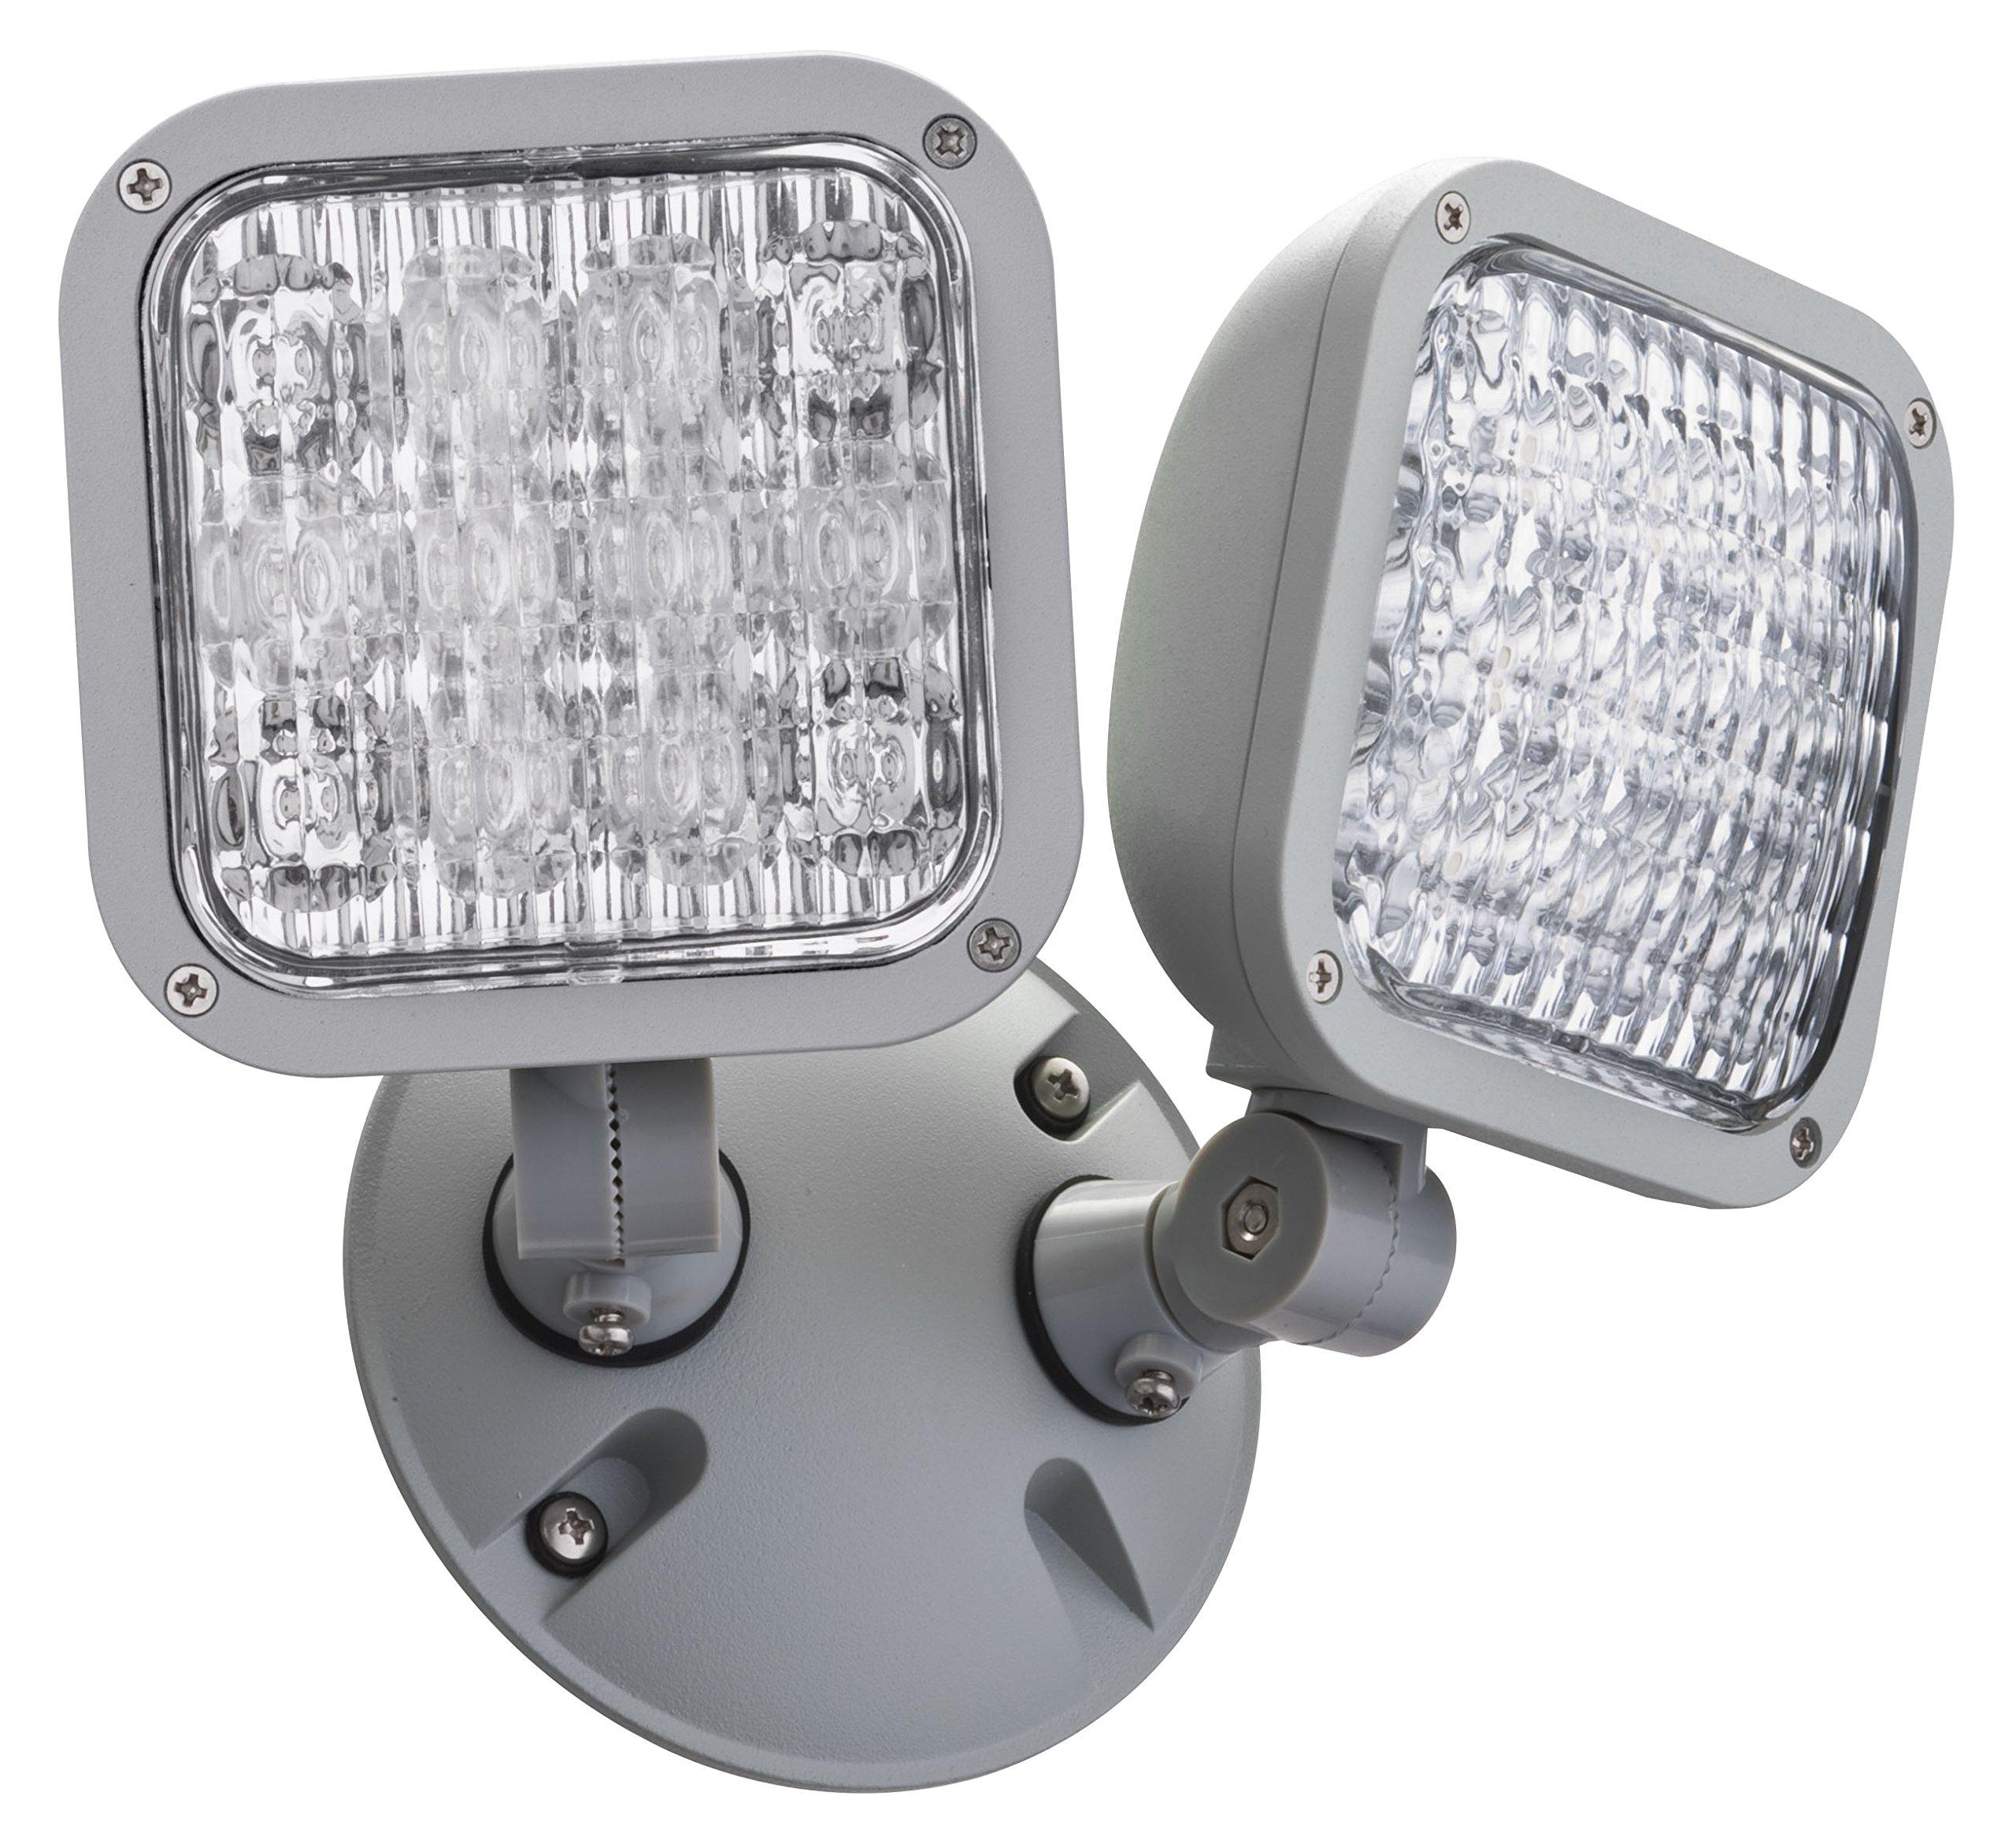 Lithonia Lighting ELA LED T WP M12 LED Emergency Remote Double, weather-proof remote Lamp Head